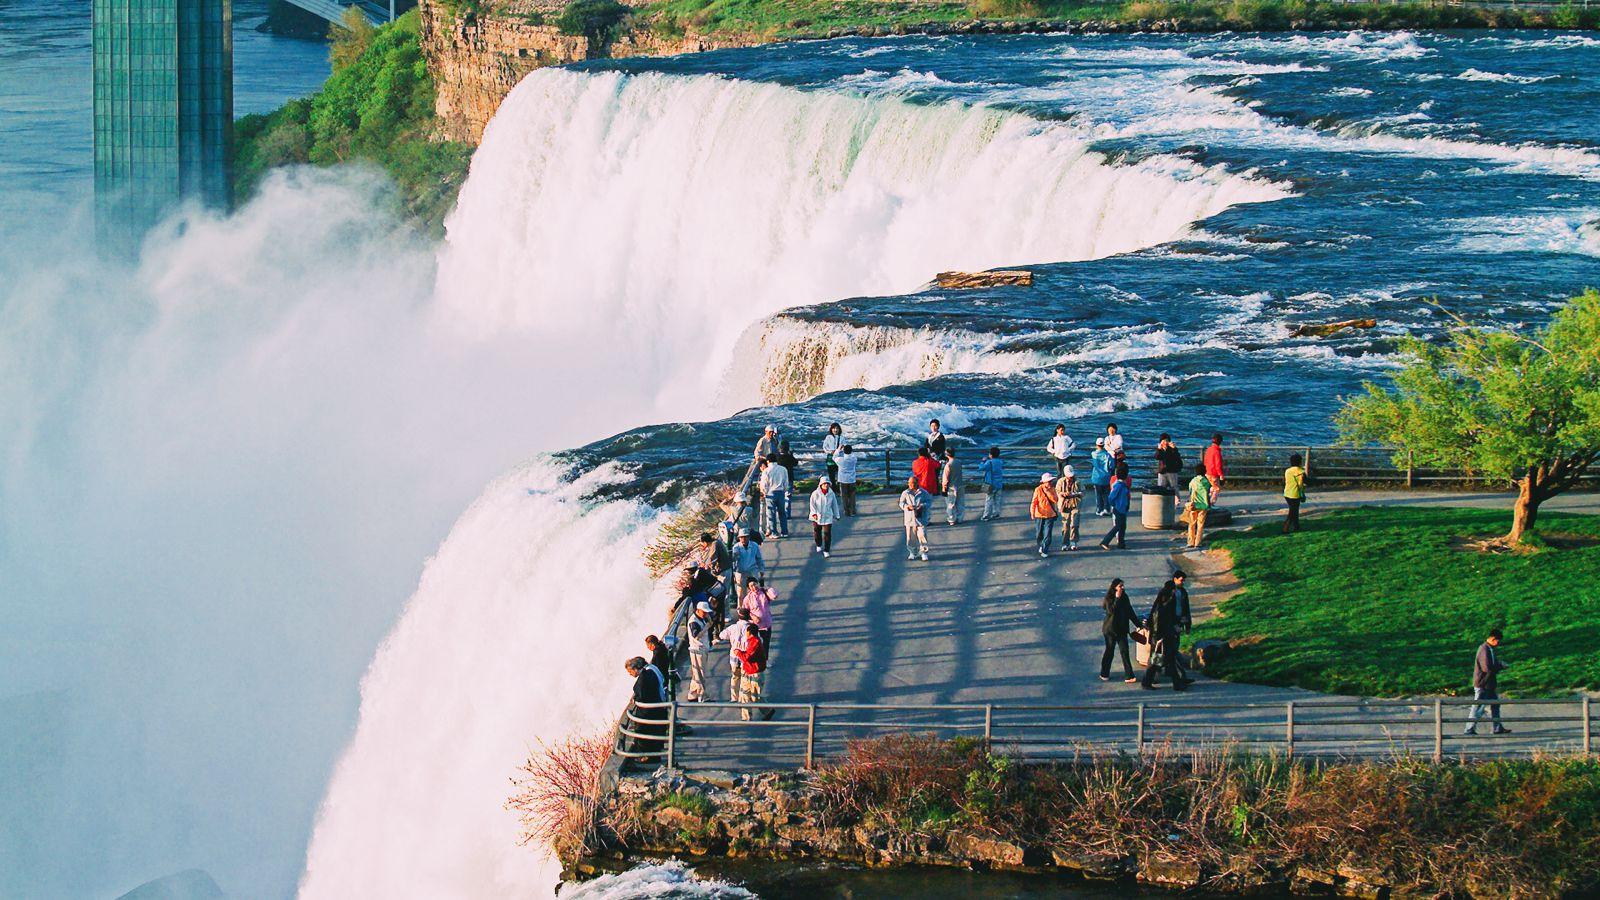 10 Amazing Waterfalls Around The World You Need To See! (7)